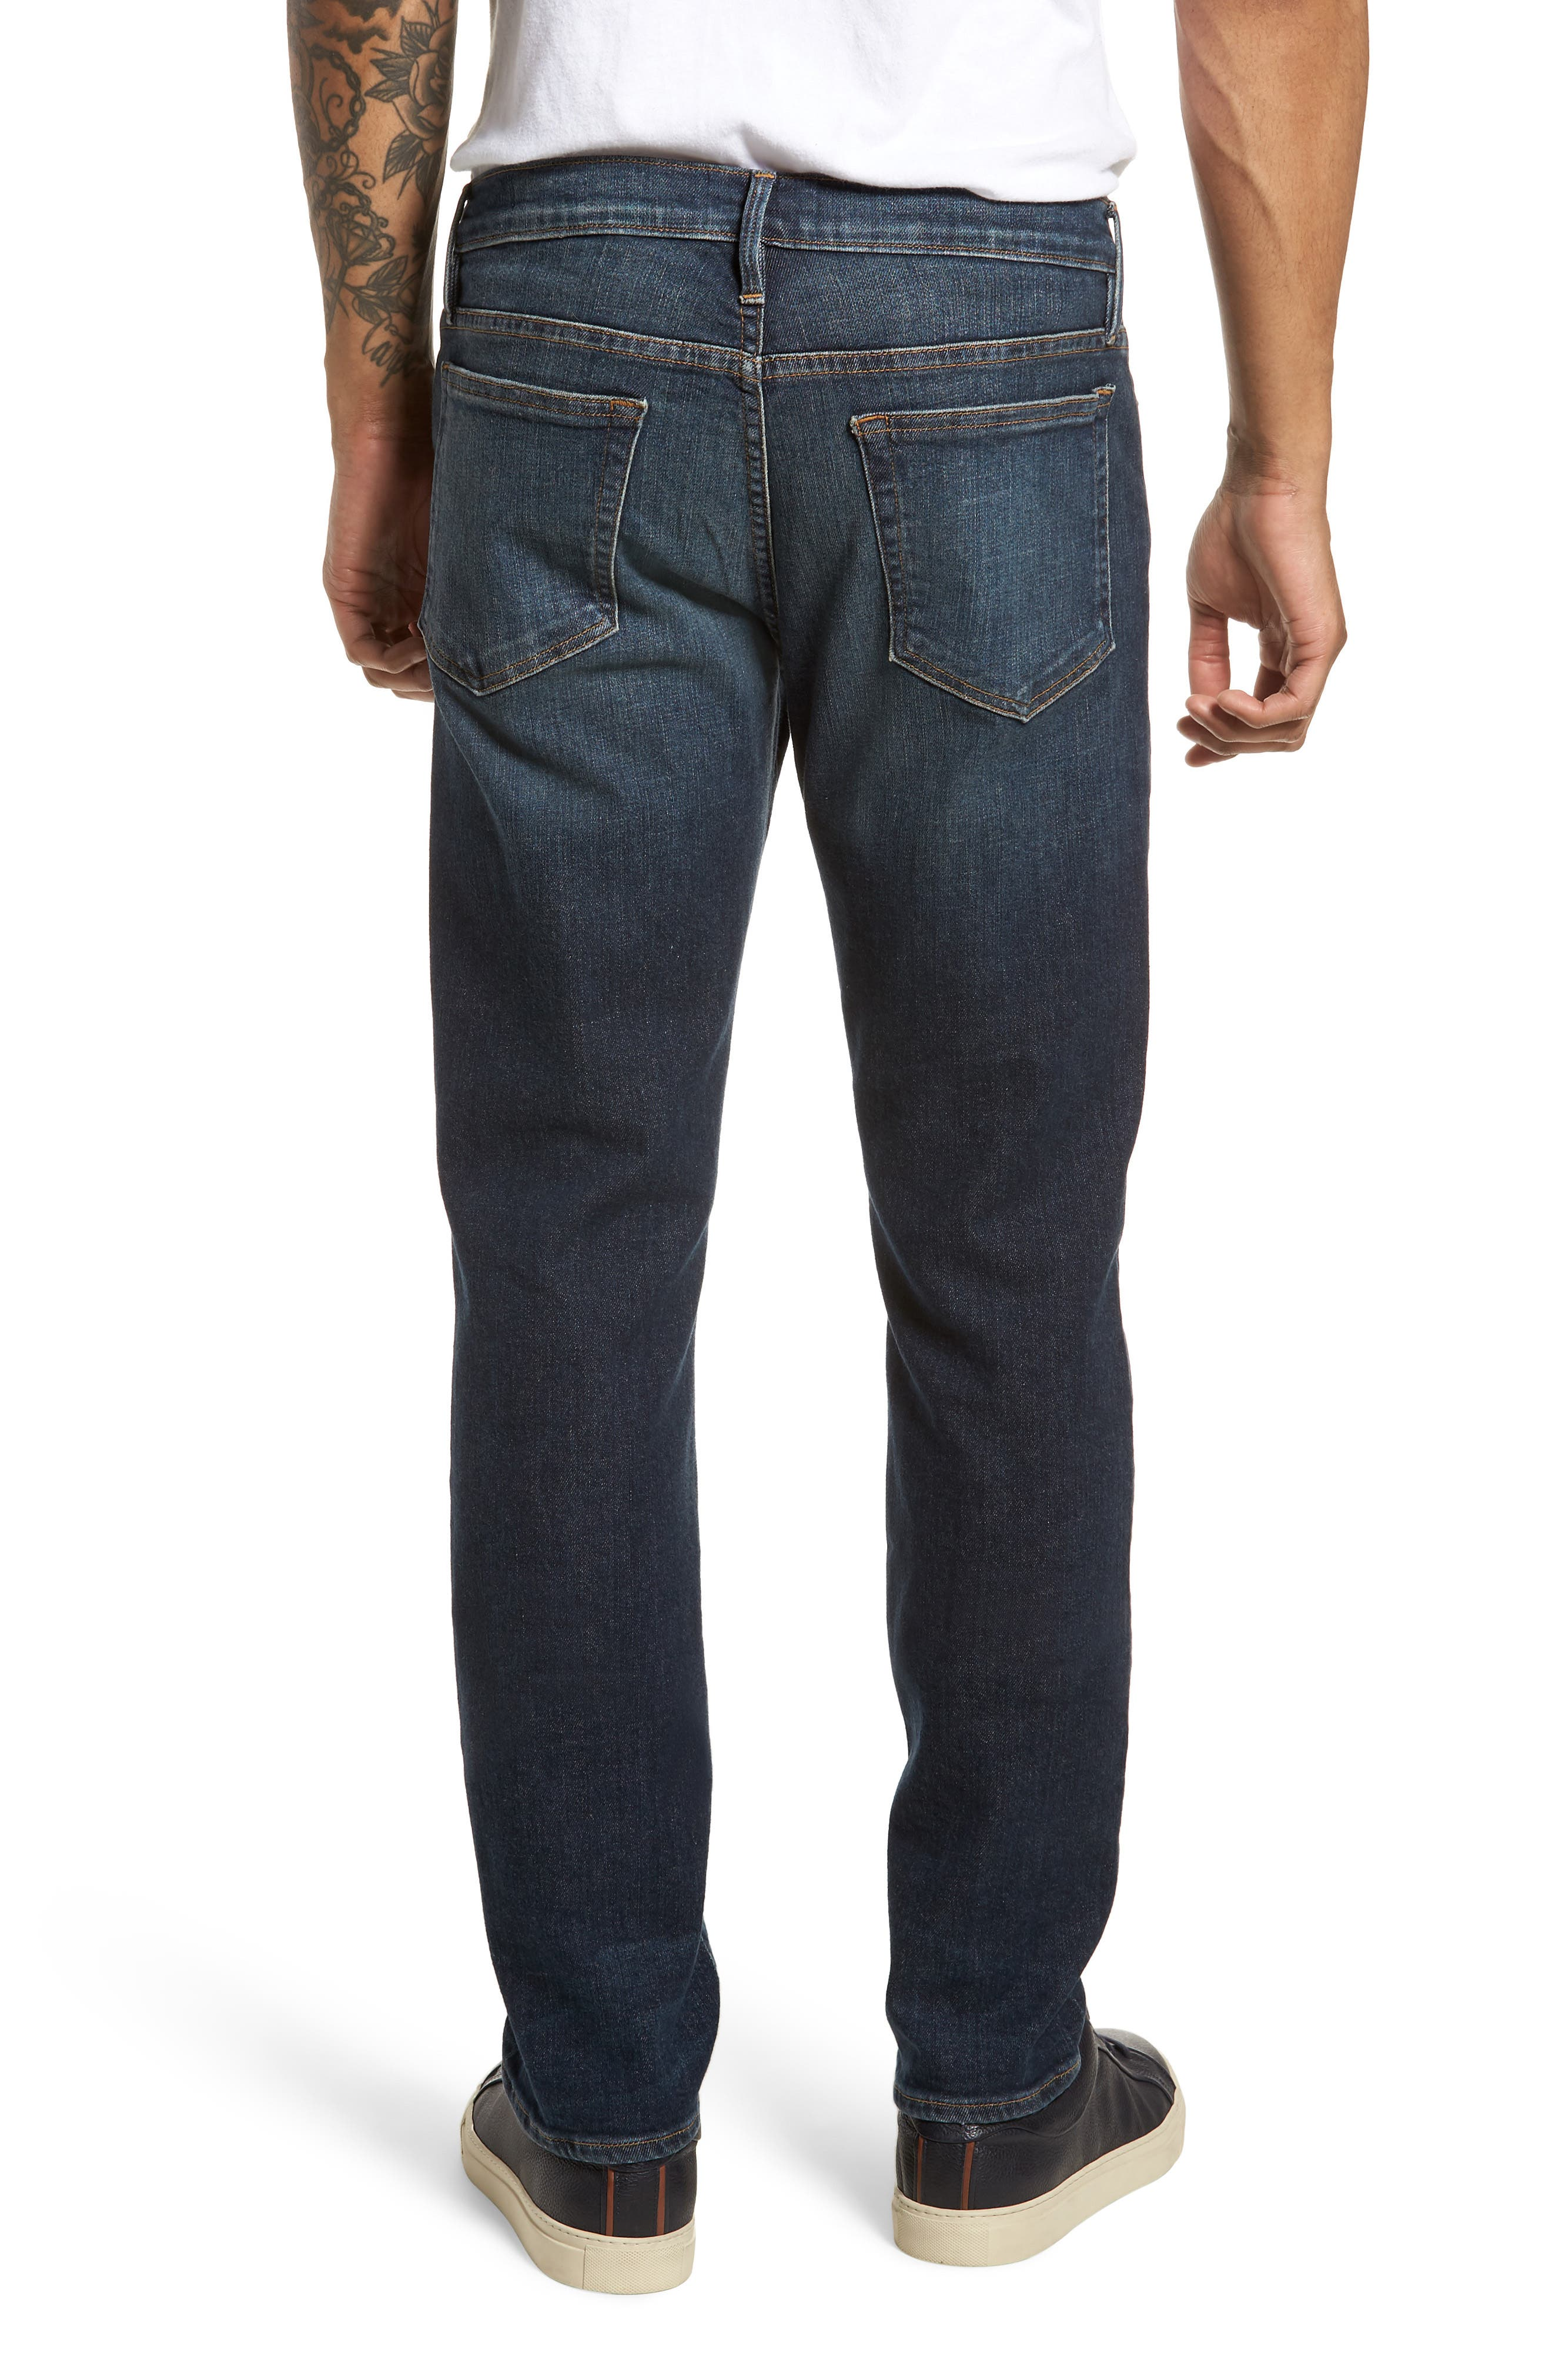 L'Homme Slim Fit Jeans,                             Alternate thumbnail 2, color,                             Joshua Tree